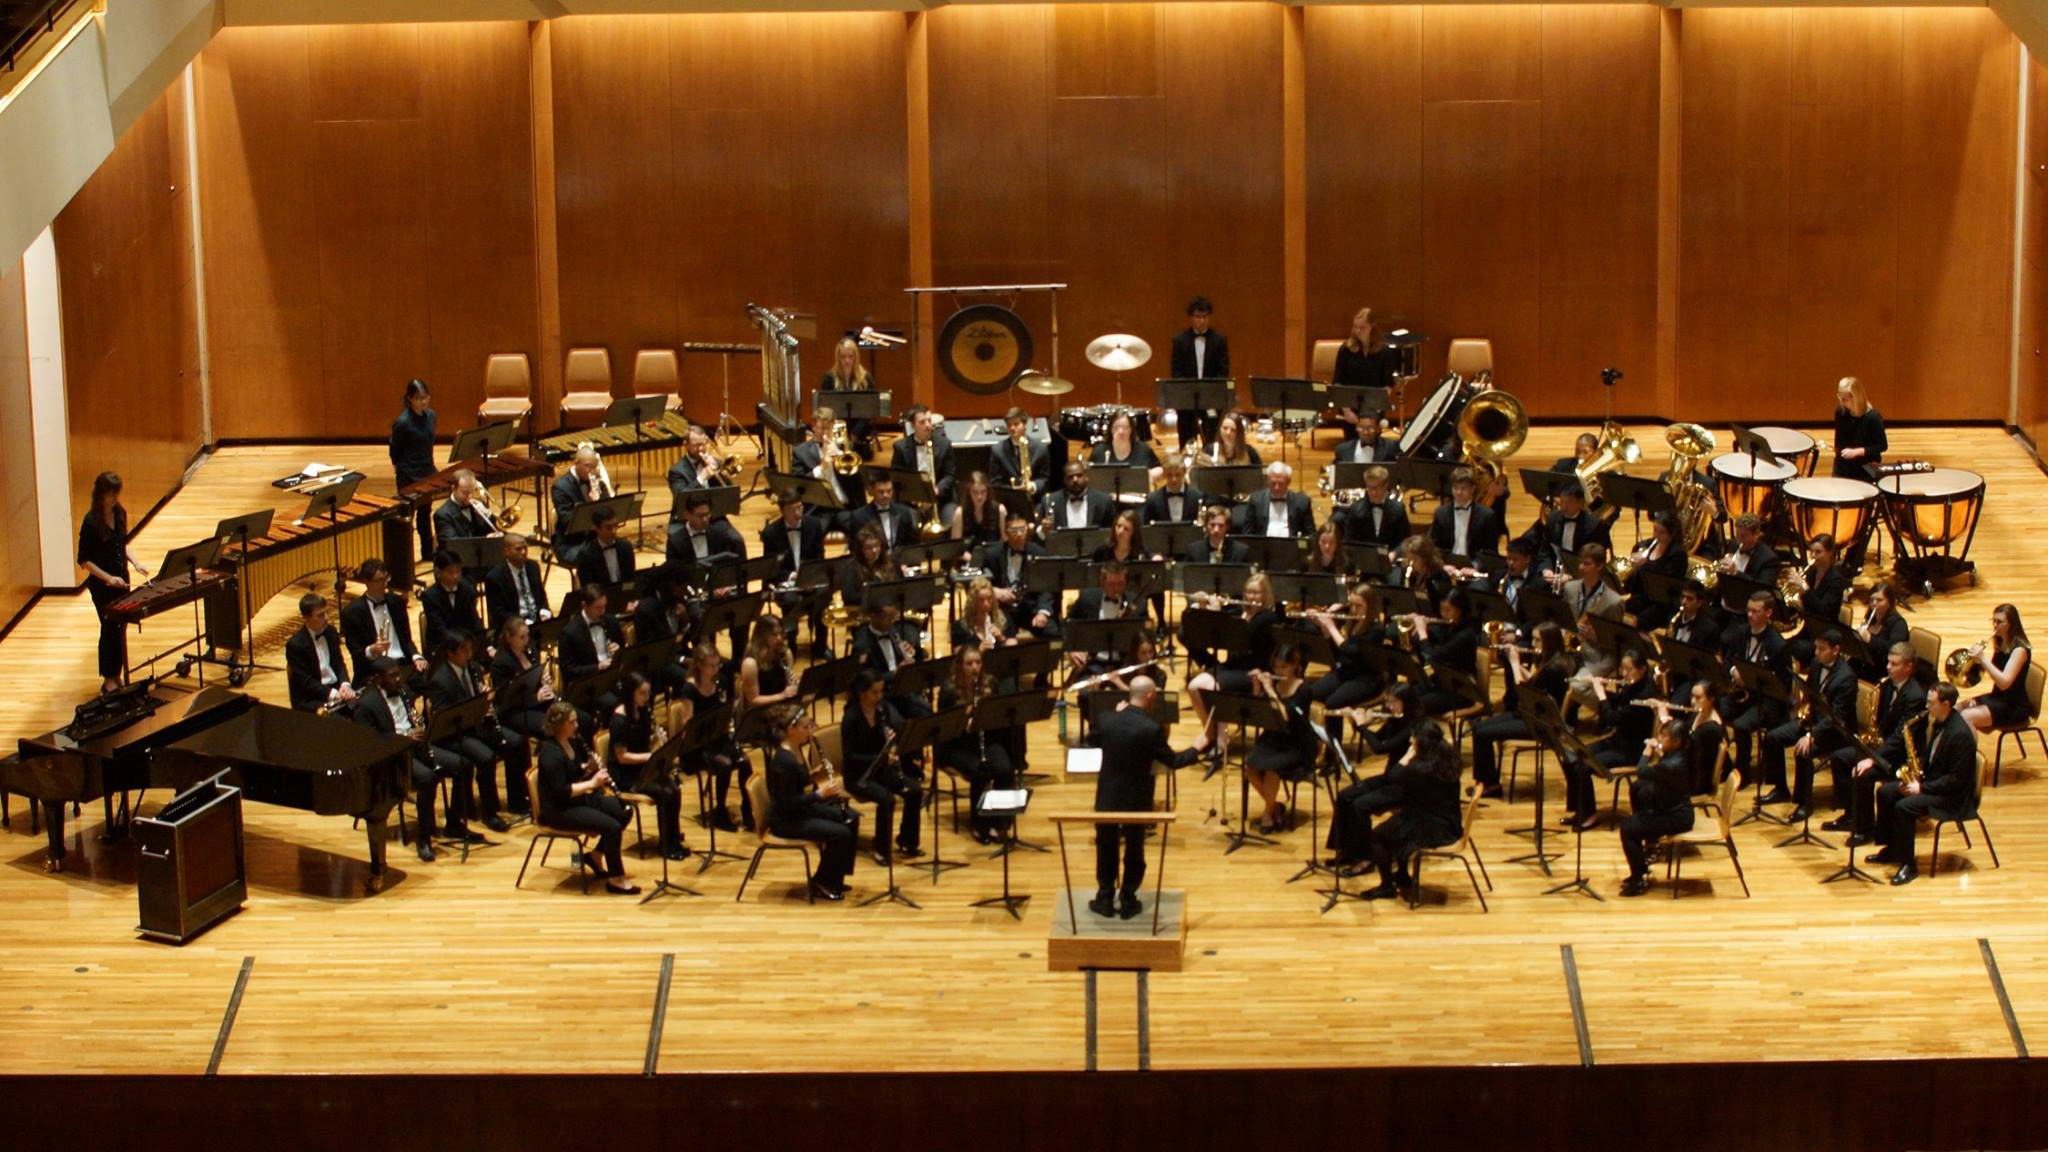 Campus Band - Barry L. Houser, conductorPatricia Vanegas Ruiz & Timothy Loman, graduate conductors